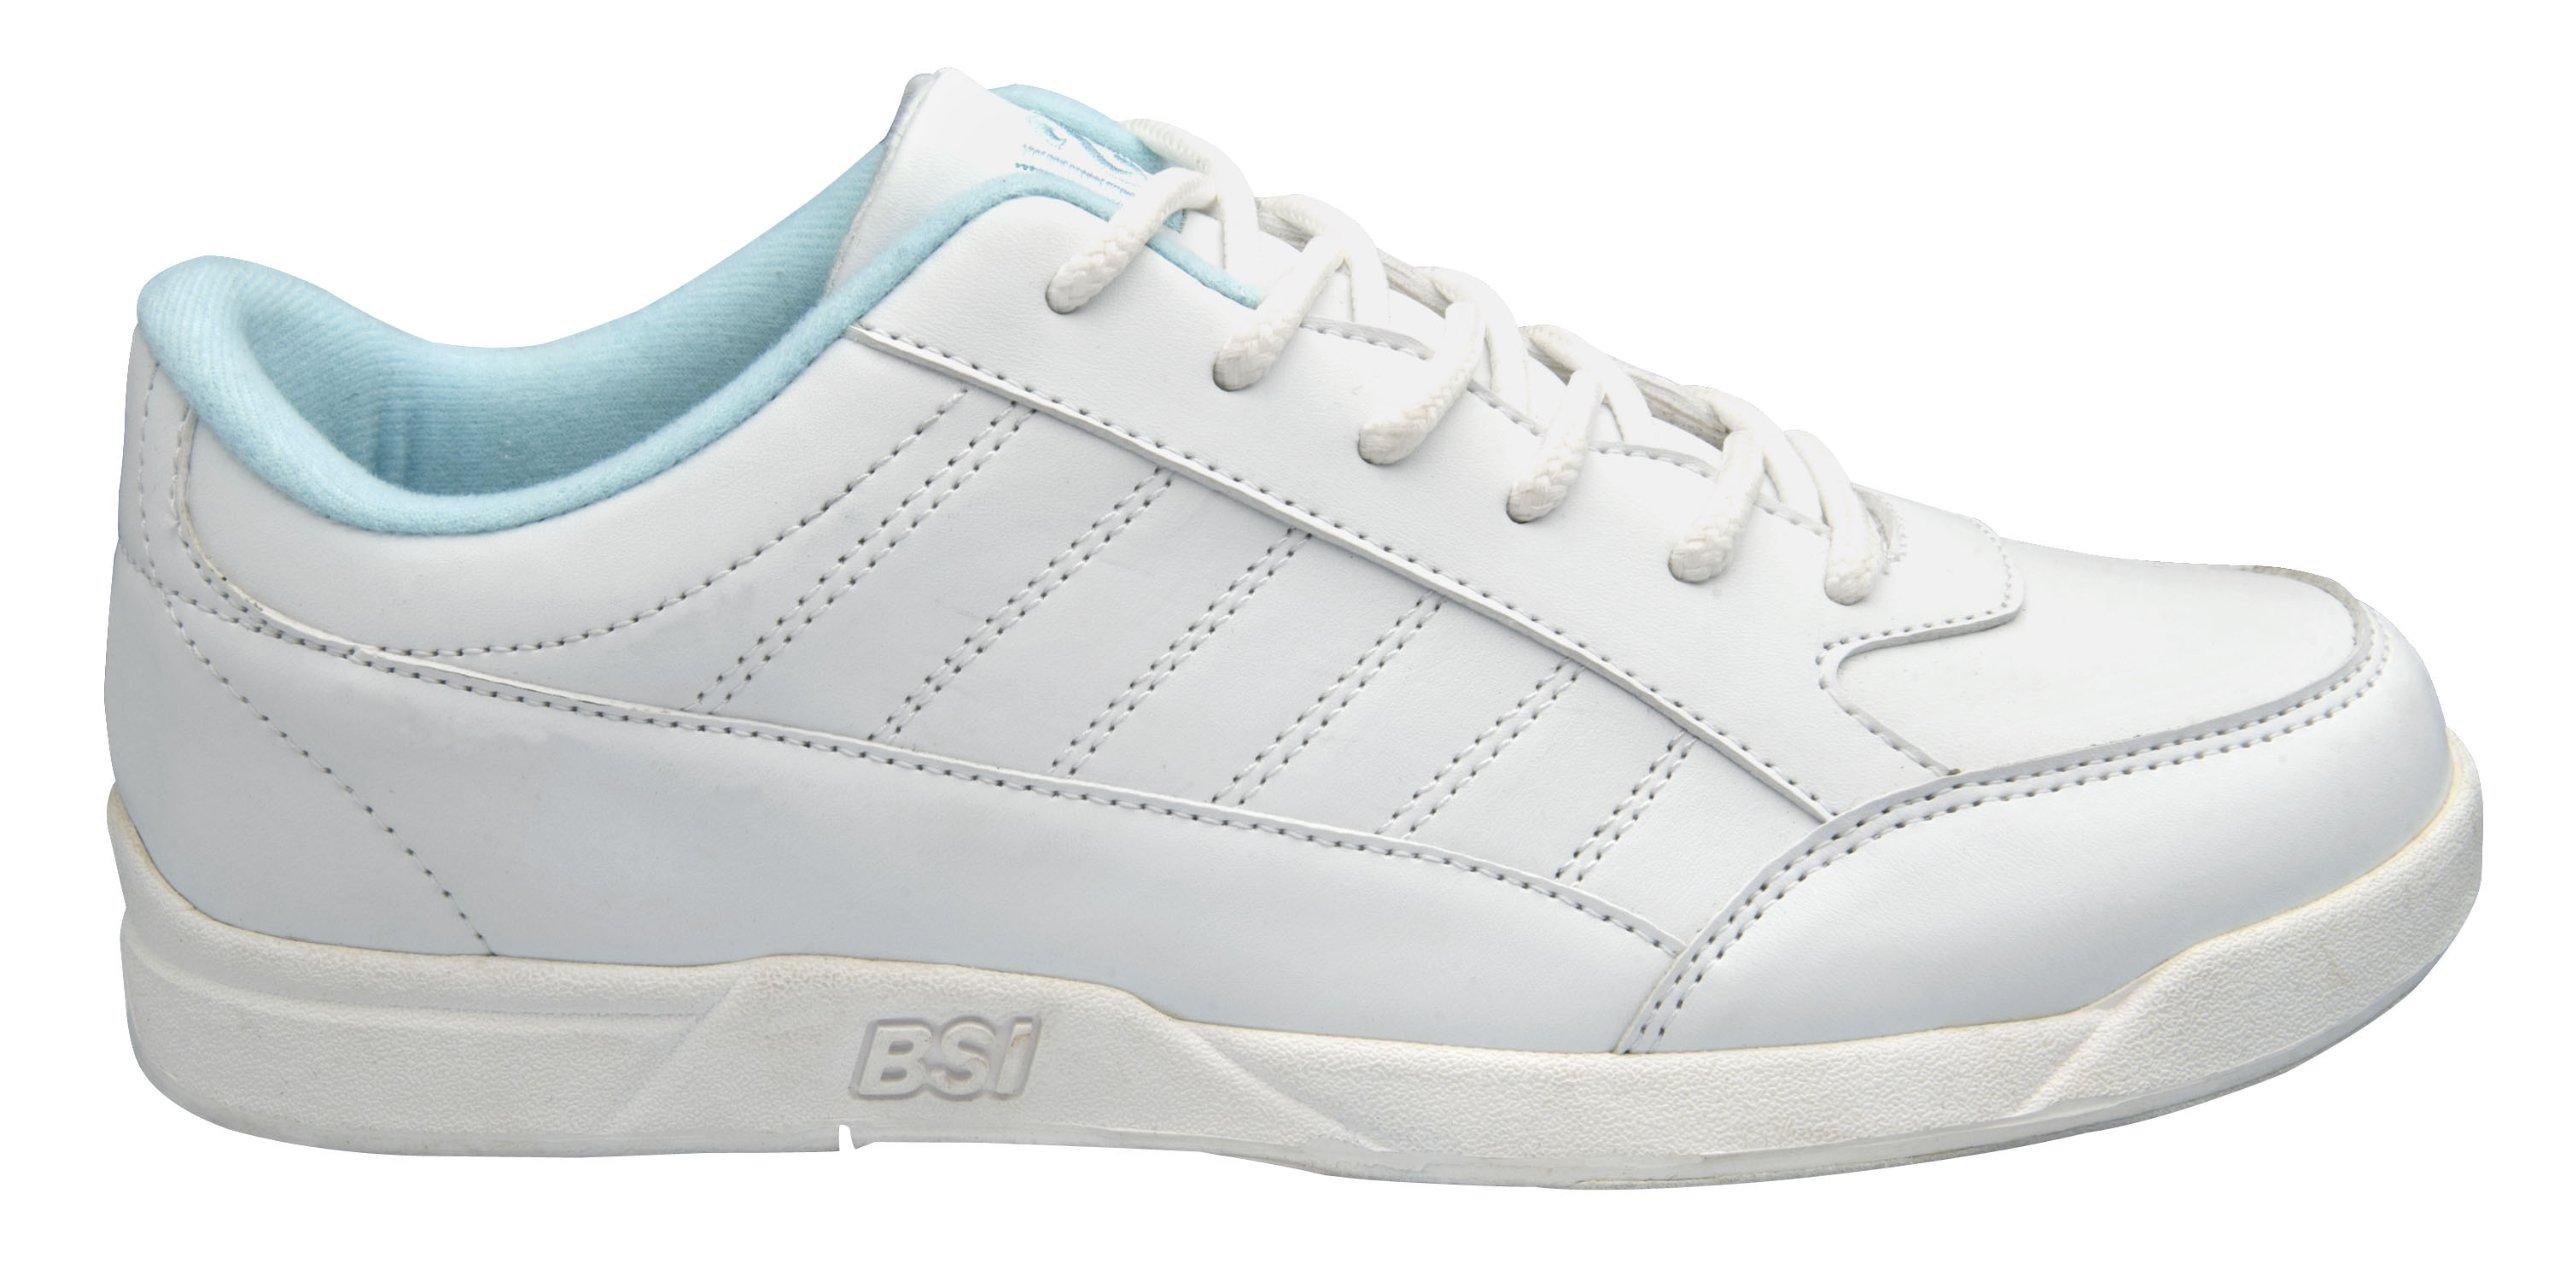 BSI Women's 422 Bowling Shoe, White/Blue, Size 9